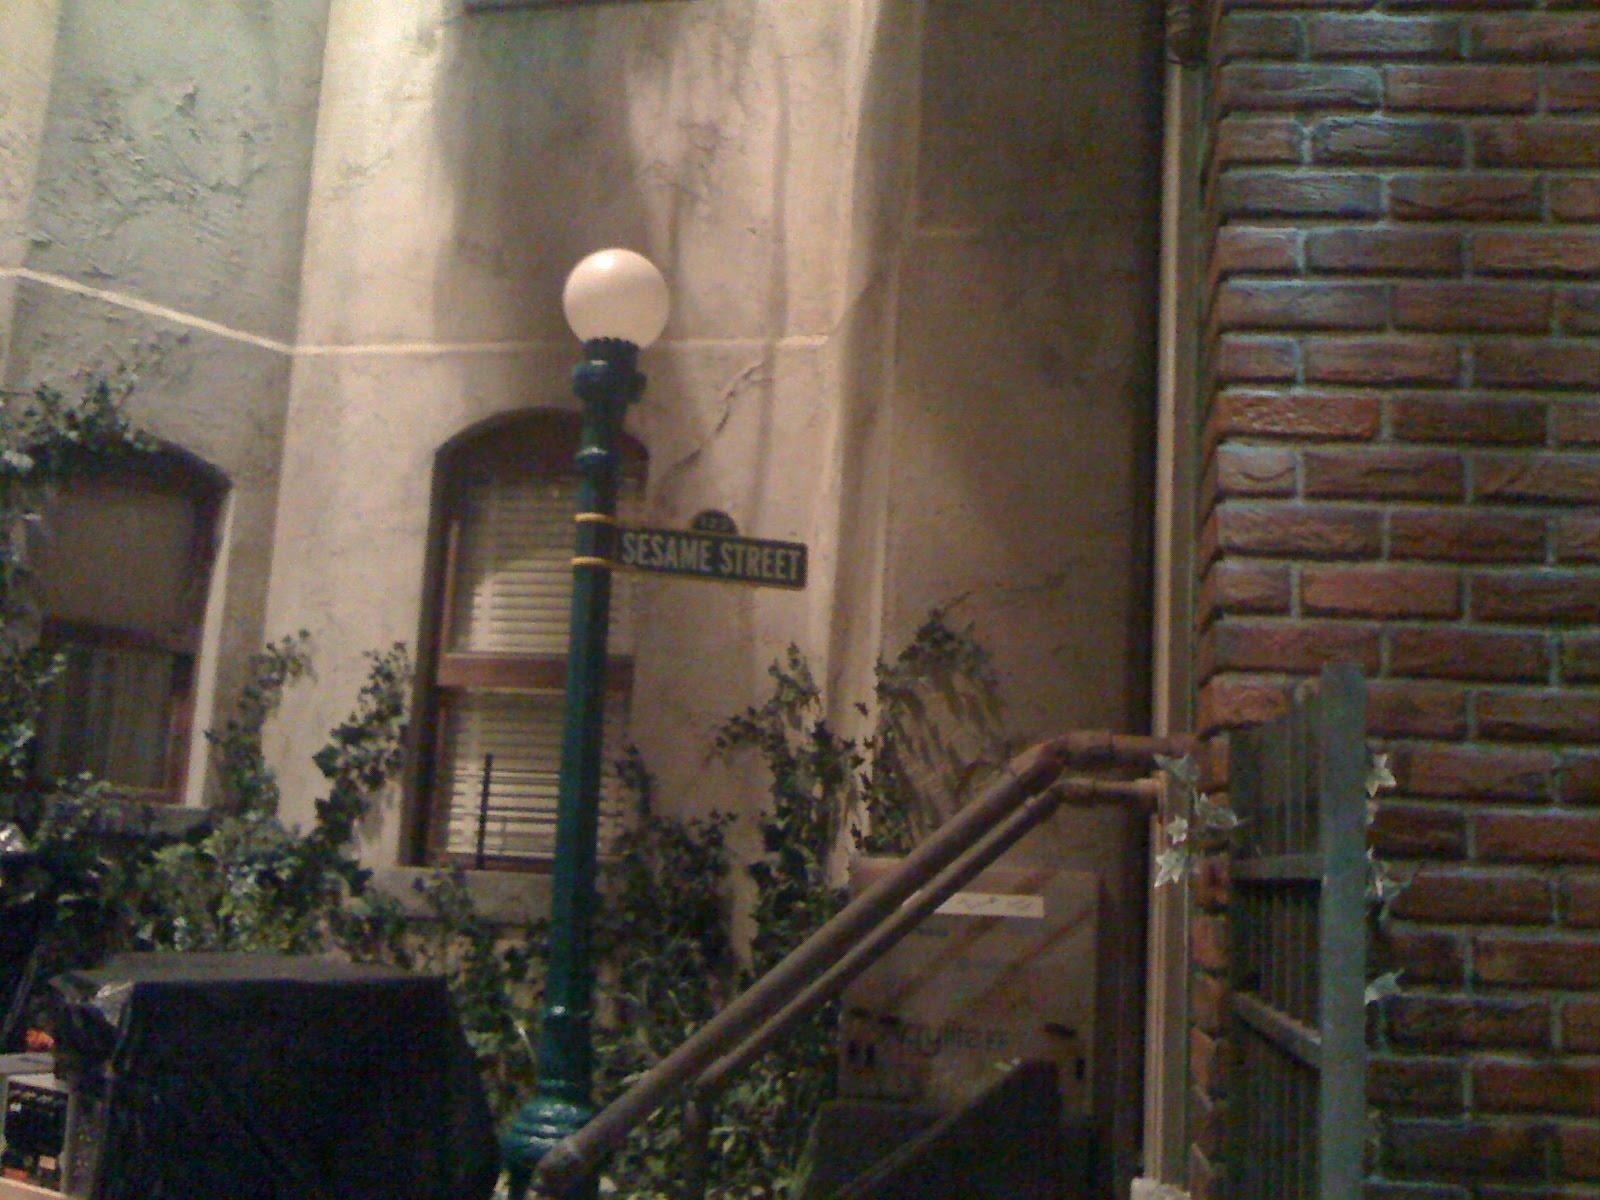 Sesame Street Set Tour Images & Pictures - Becuo Sesame Street Set Tour